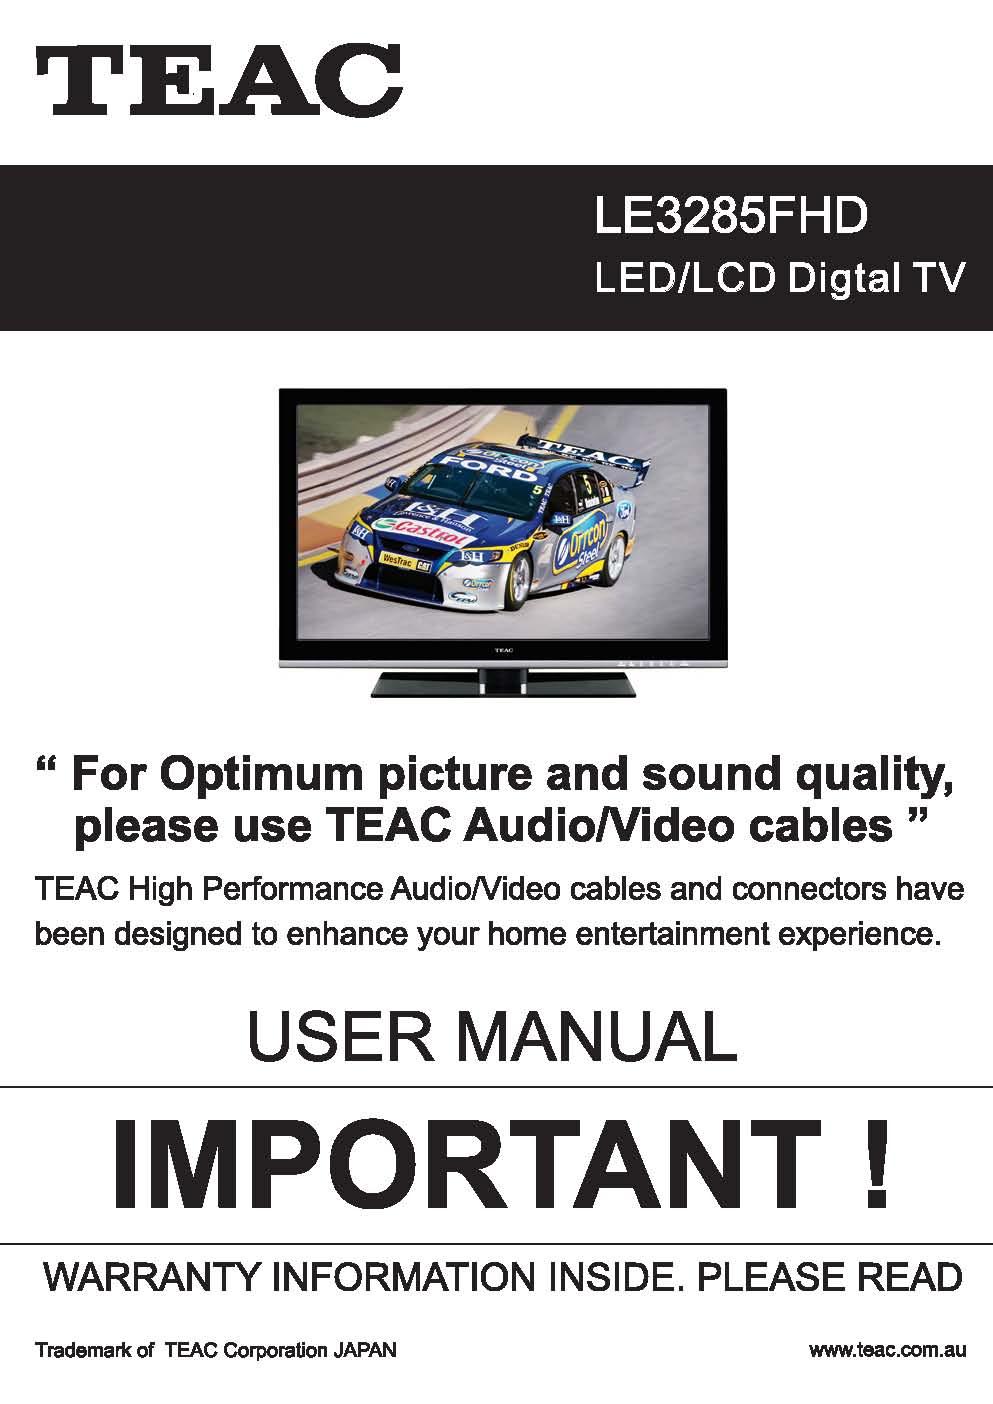 TEAC LE3285FHD User Manual